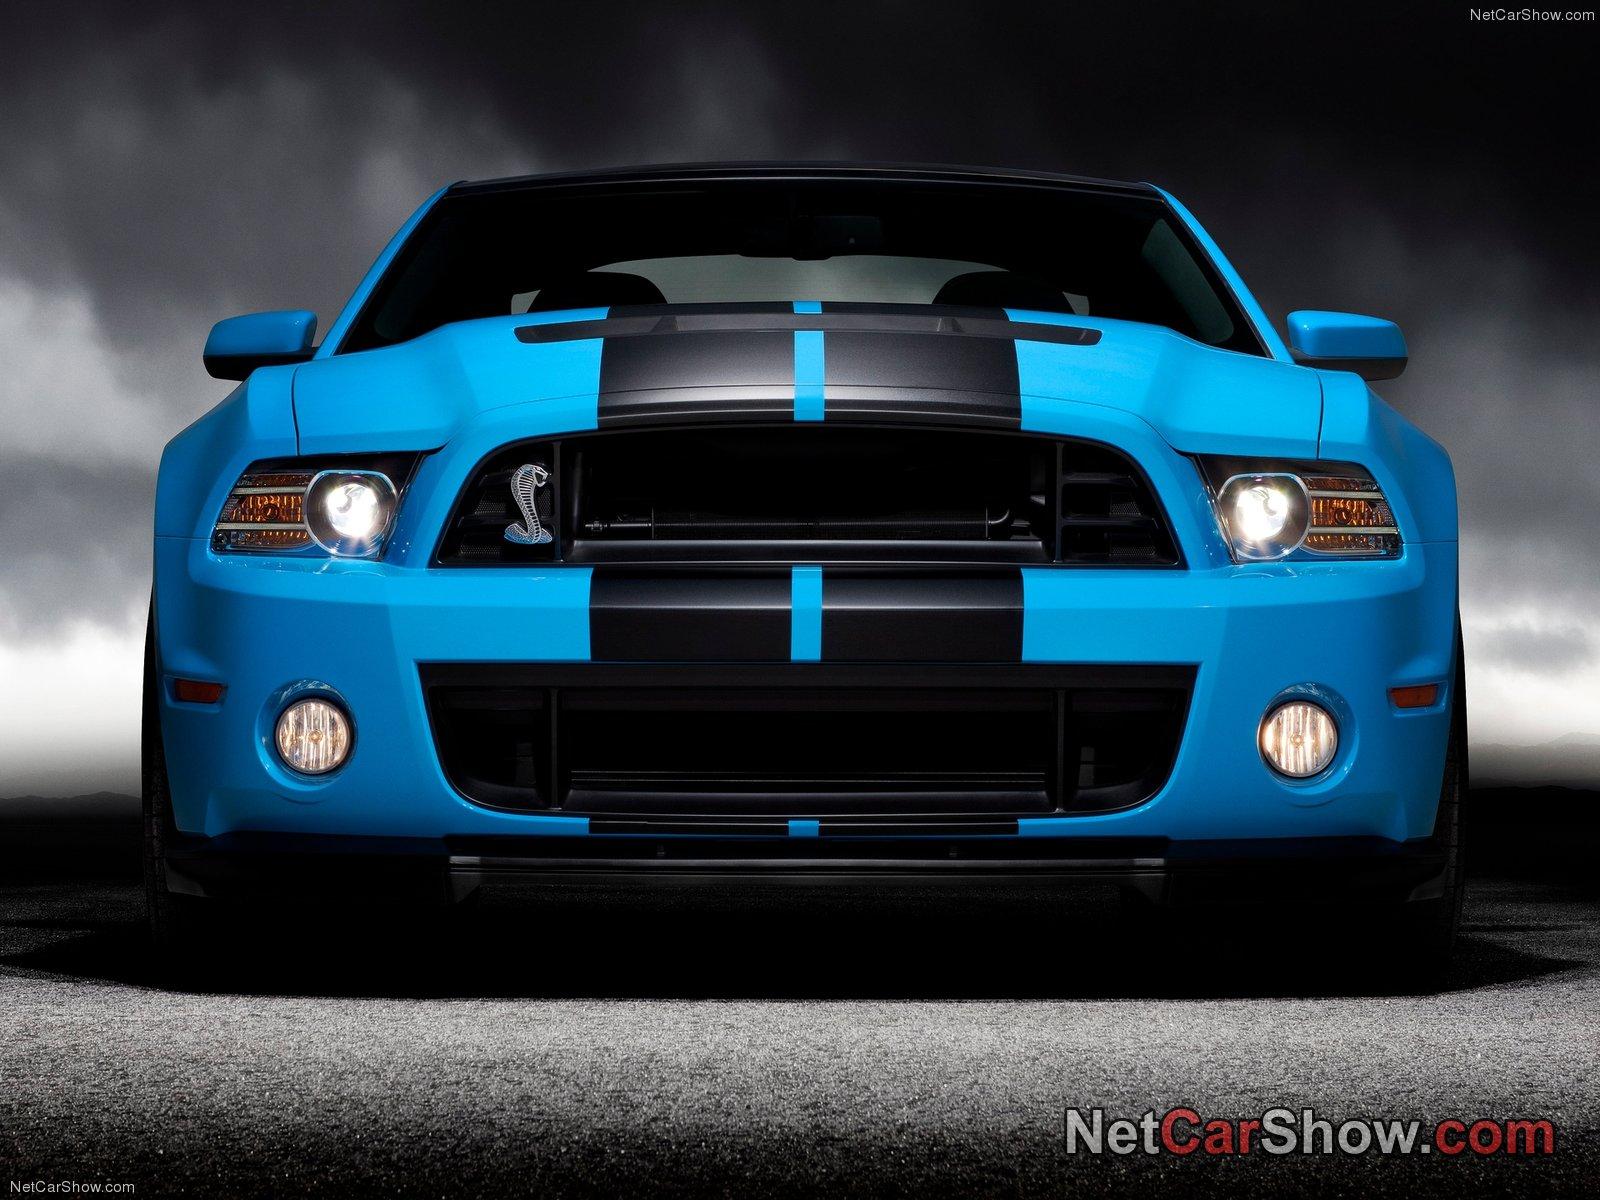 http://4.bp.blogspot.com/-YxdwP-0EMx4/TylECtjXjNI/AAAAAAAAAJg/MU2nEqmZtxY/s1600/Ford-Mustang_Shelby_GT500_2013_1600x1200_wallpaper_08.jpg